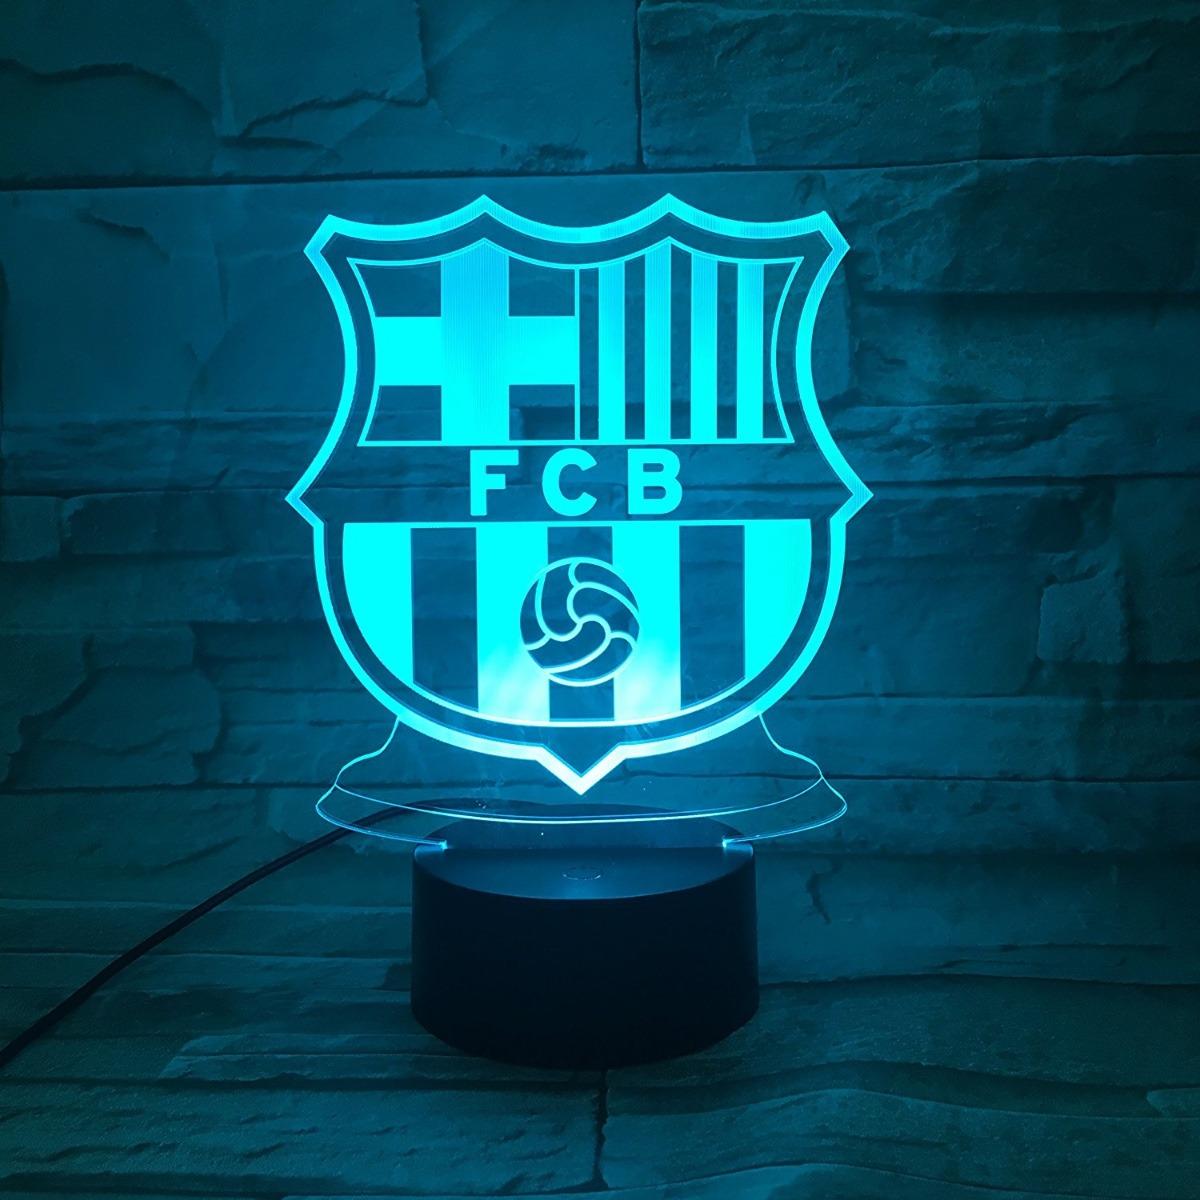 Escudo Fc Barcelona Lampara Efecto 3d Fan Camiseta Futbol